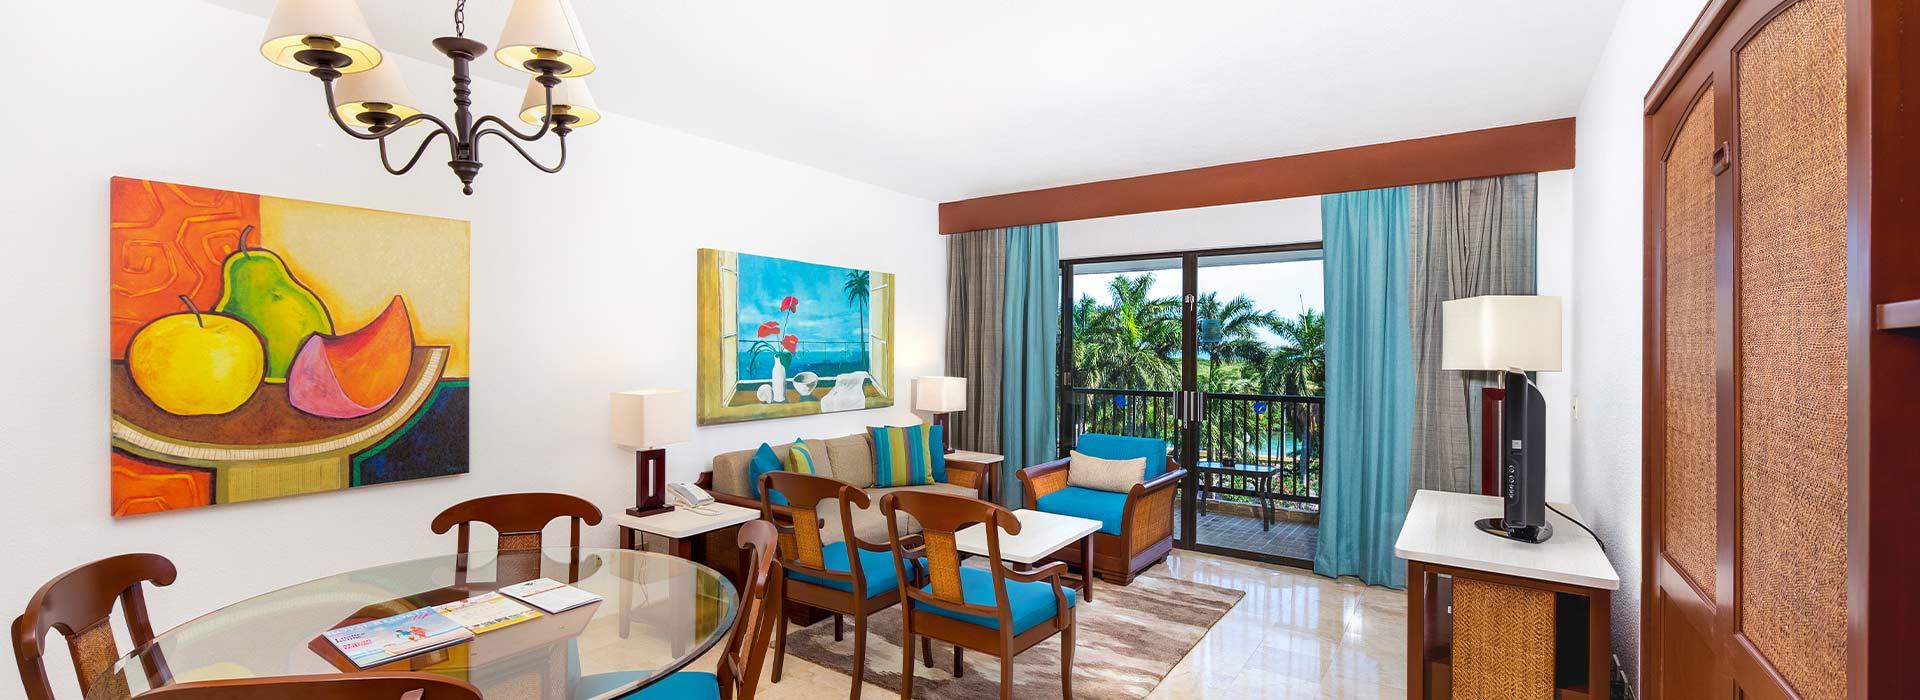 The Royal Cancun Resort